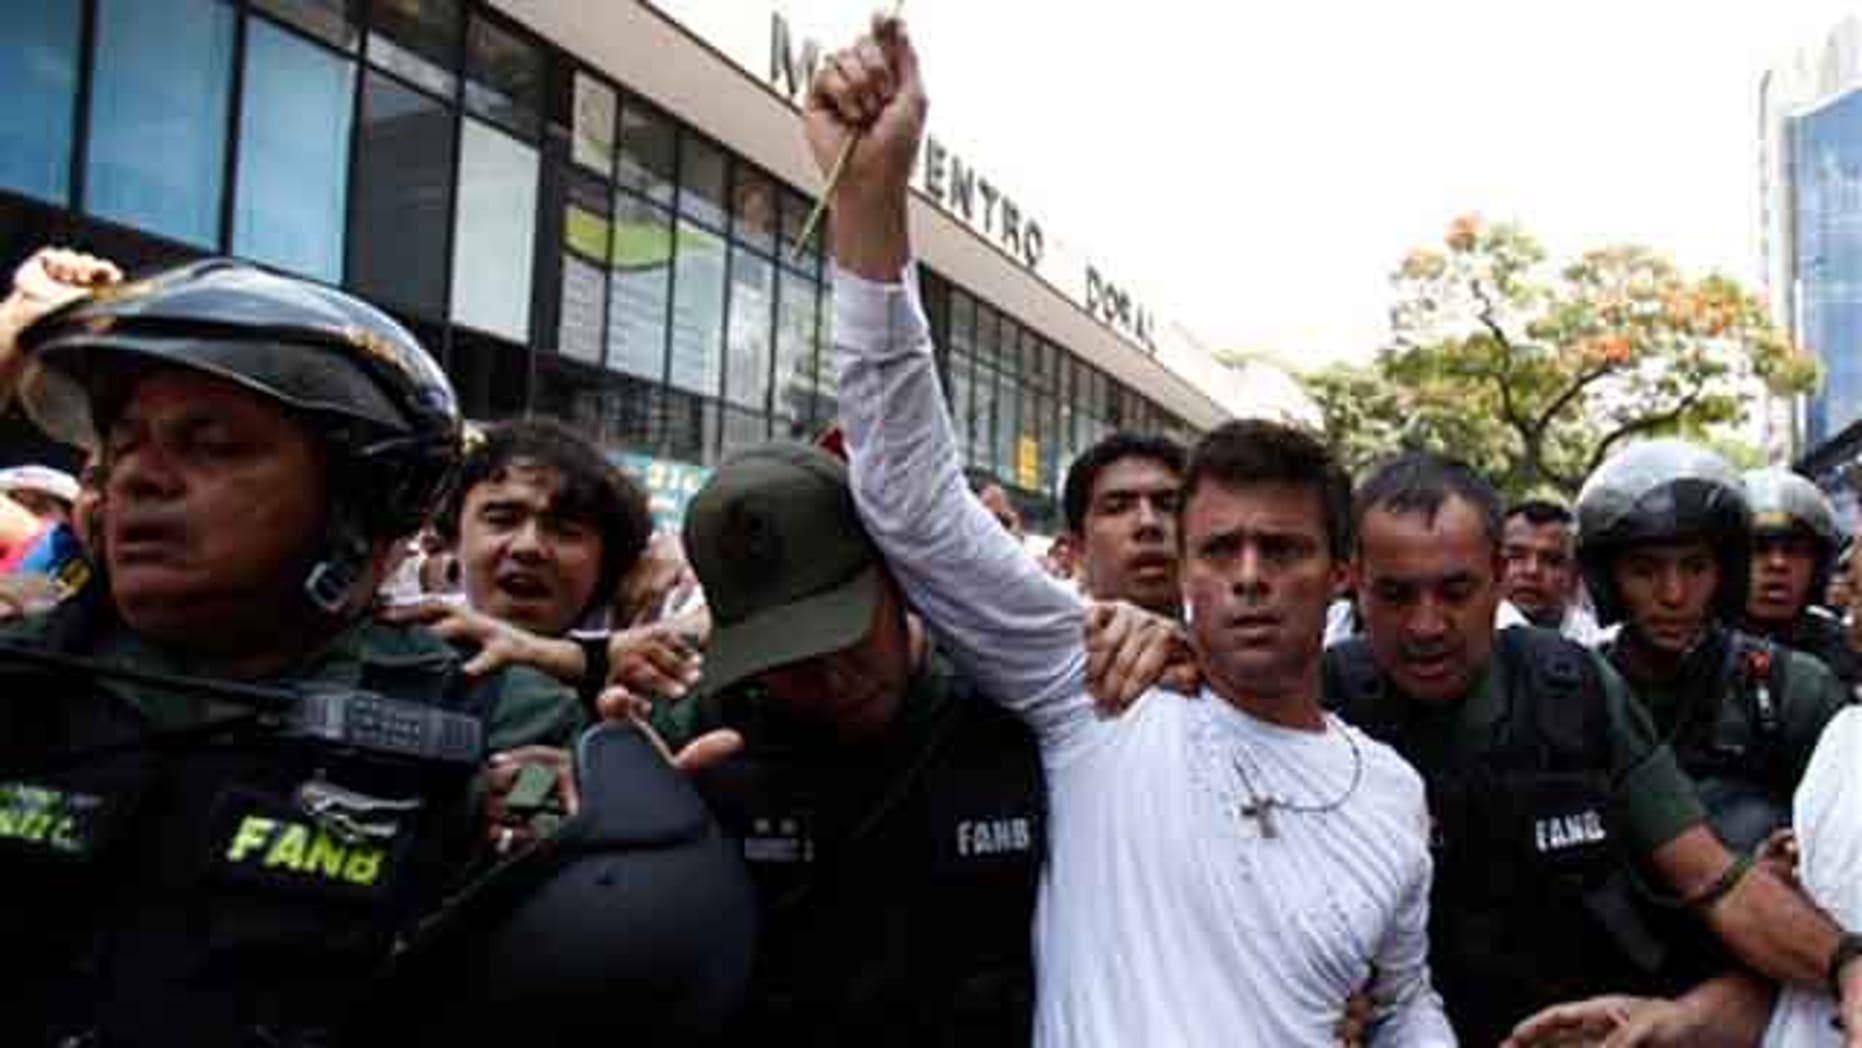 Opposition leader Leopoldo Lopez, in a Feb. 18, 2014 file photo.